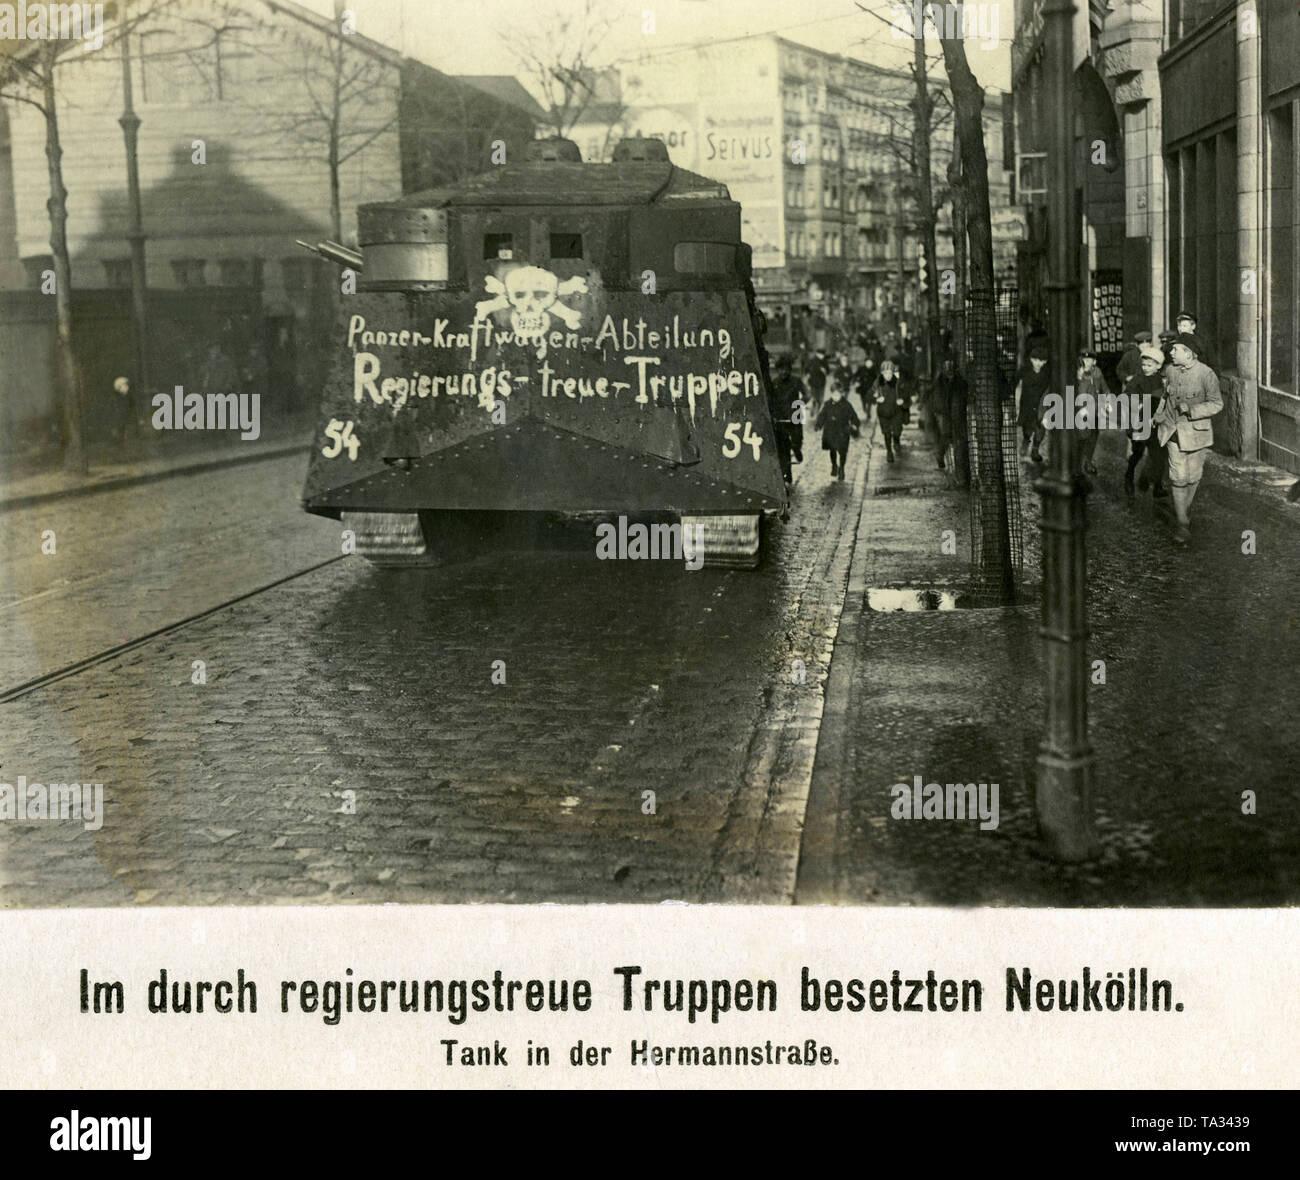 Panzerwagen Stock Photos & Panzerwagen Stock Images - Alamy